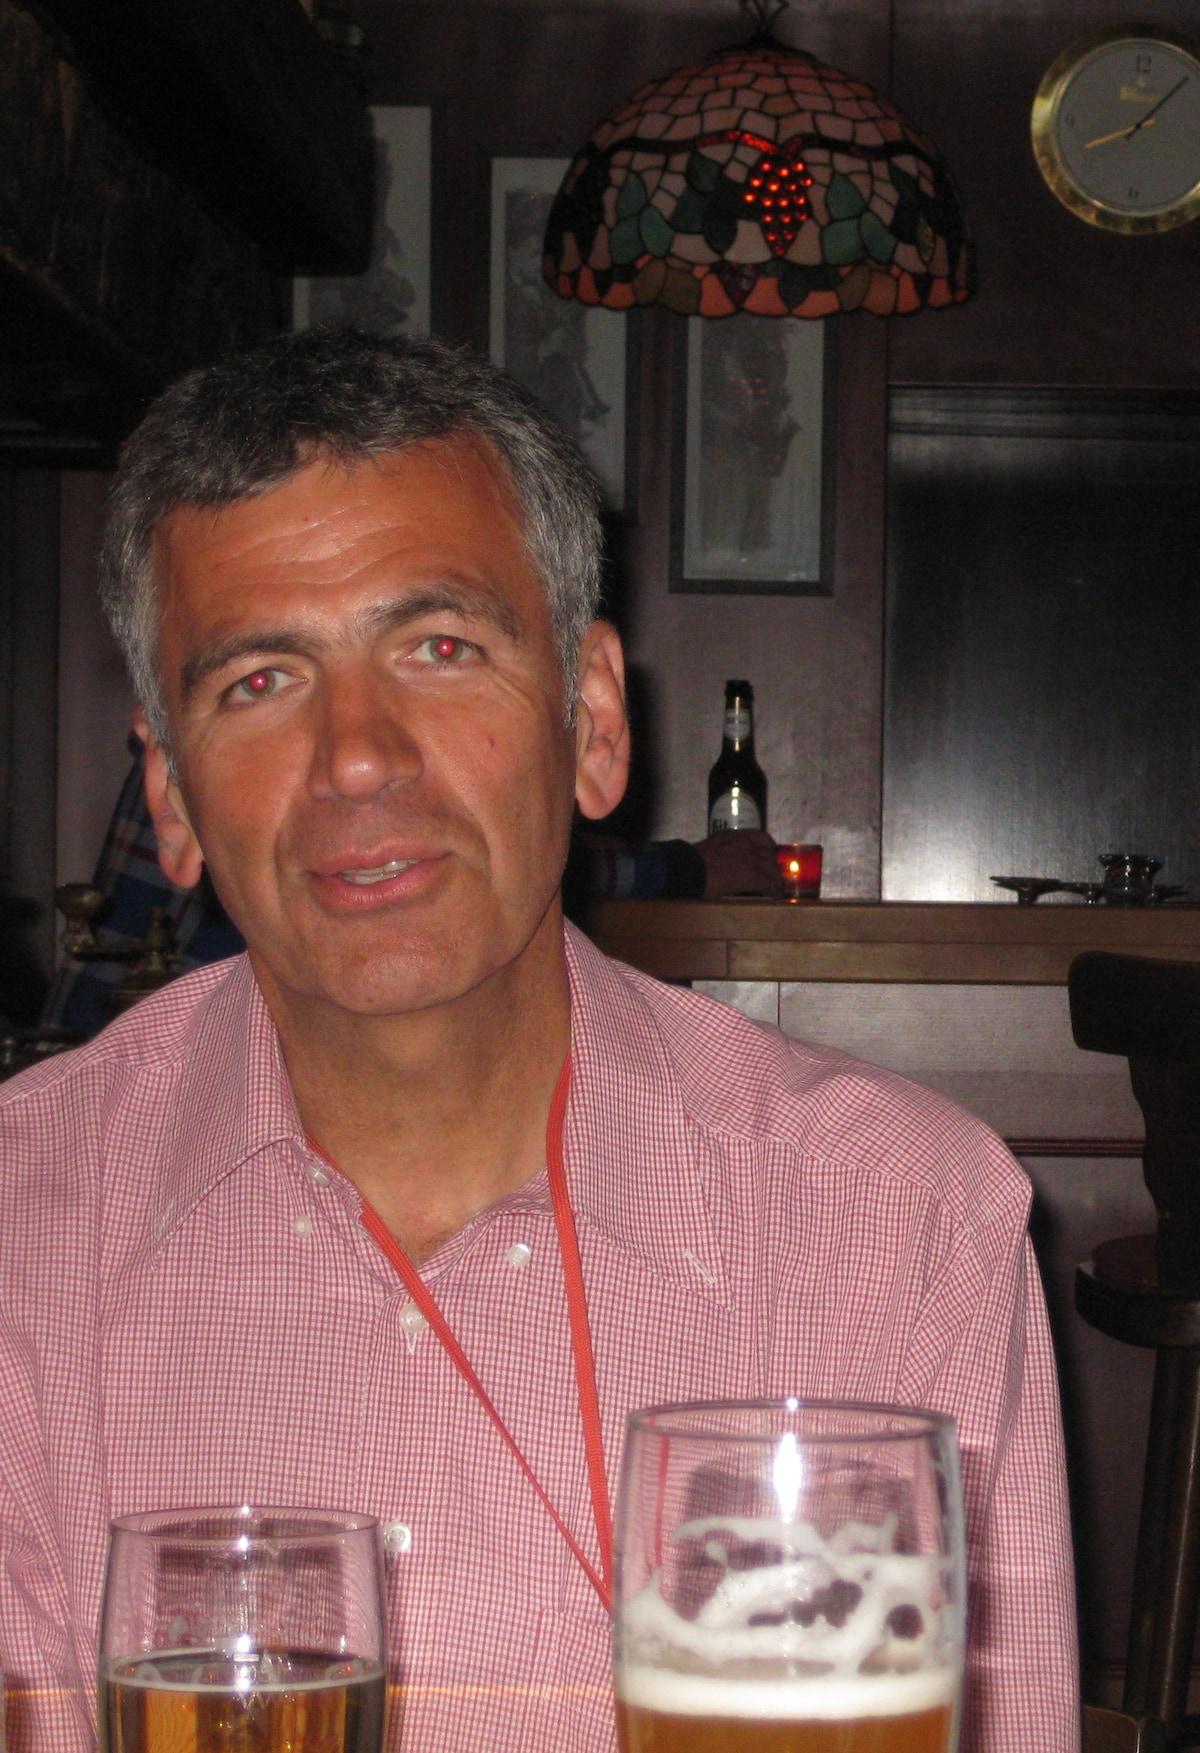 Ioannis from Corfu